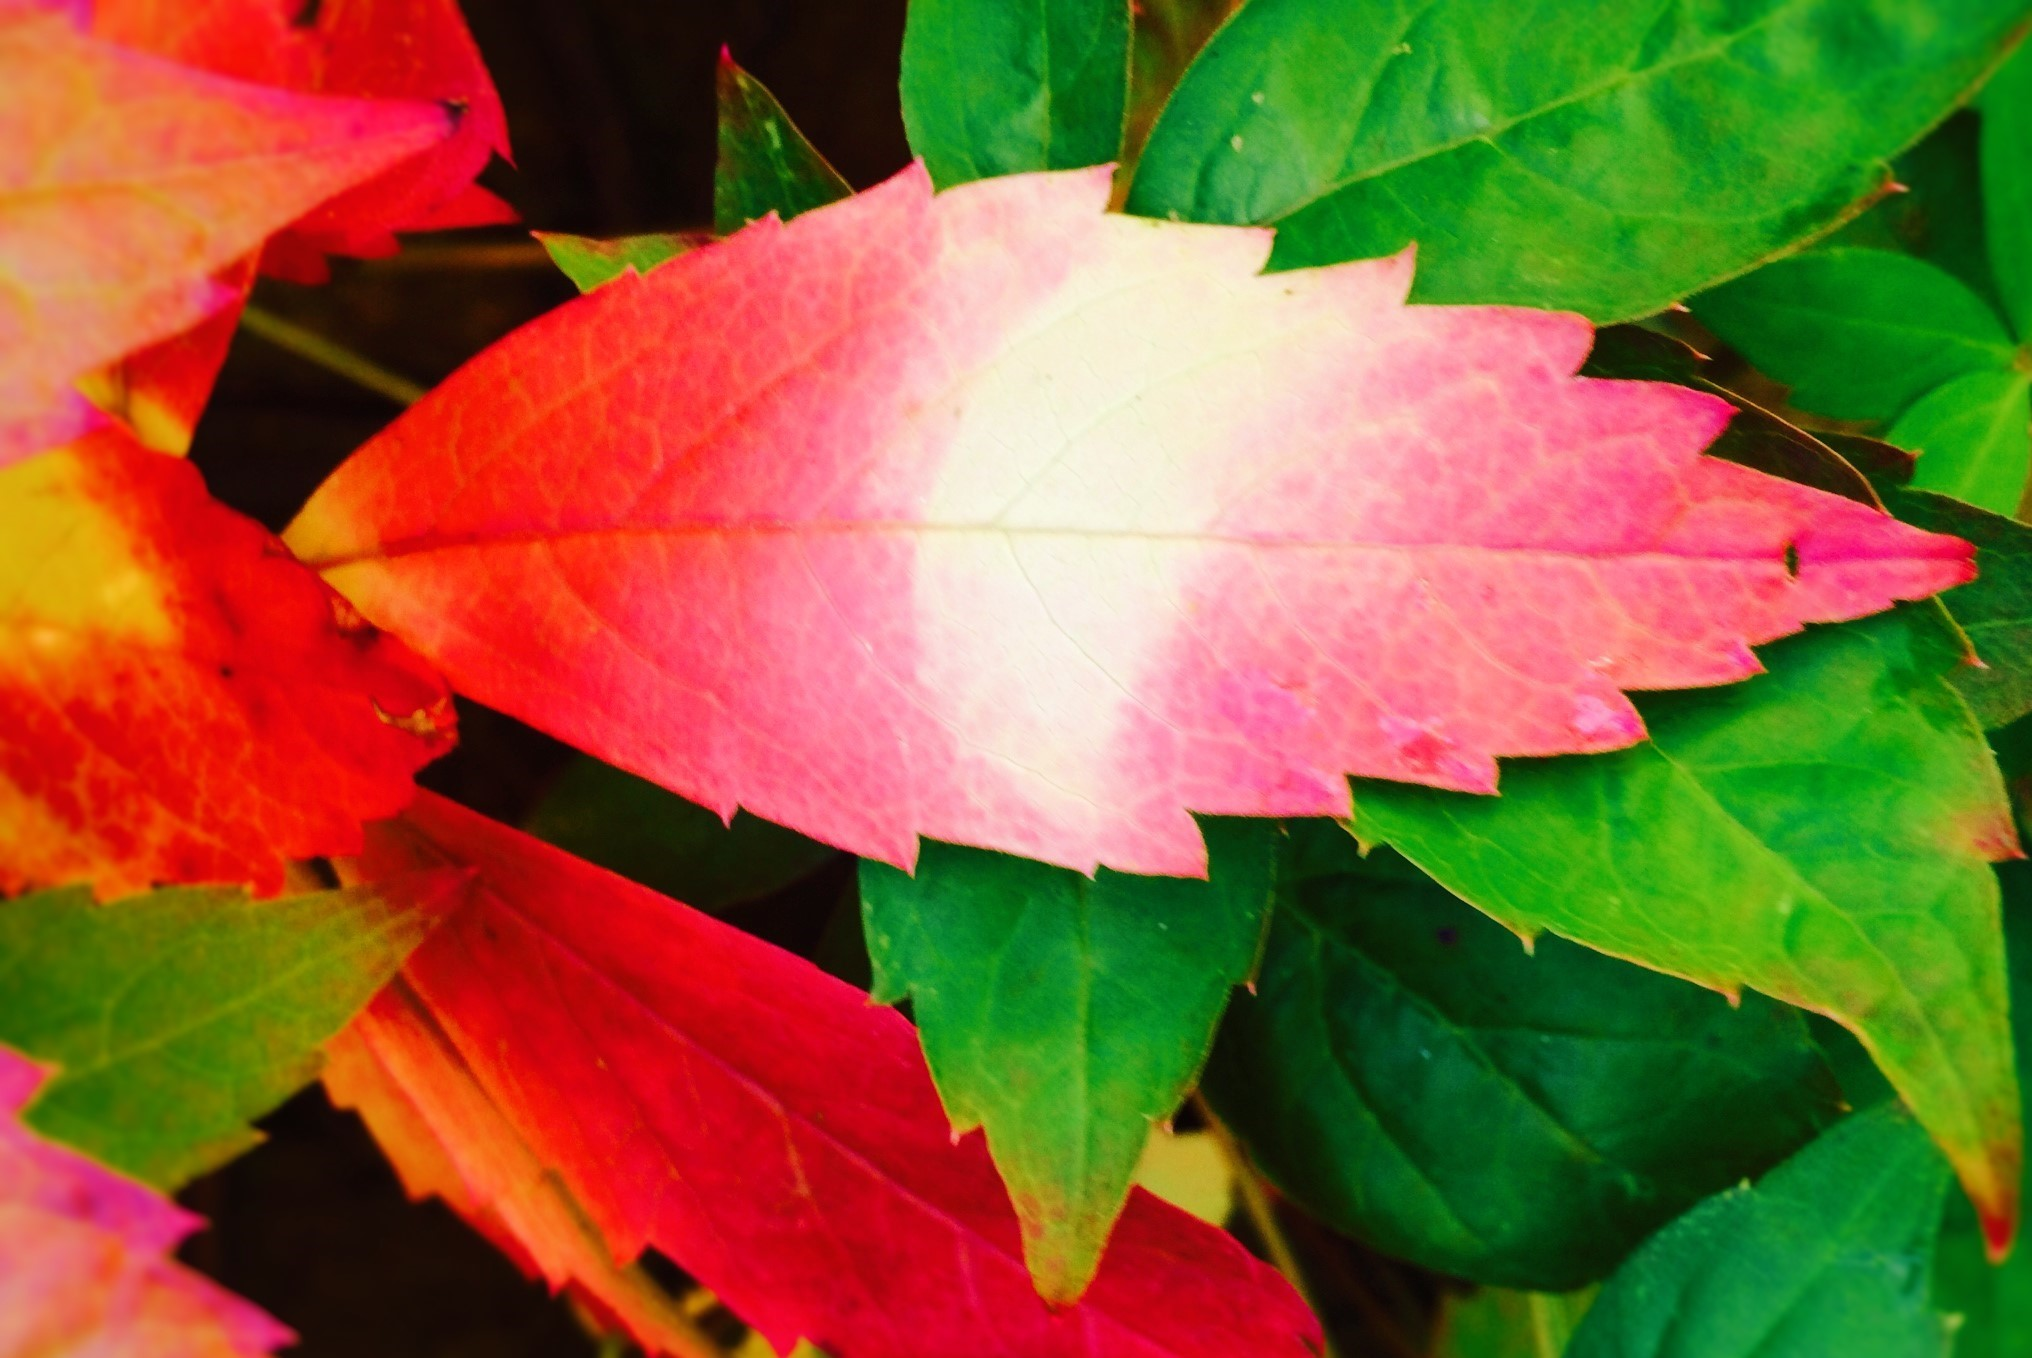 GARDEN - Colourful Autumn leaves